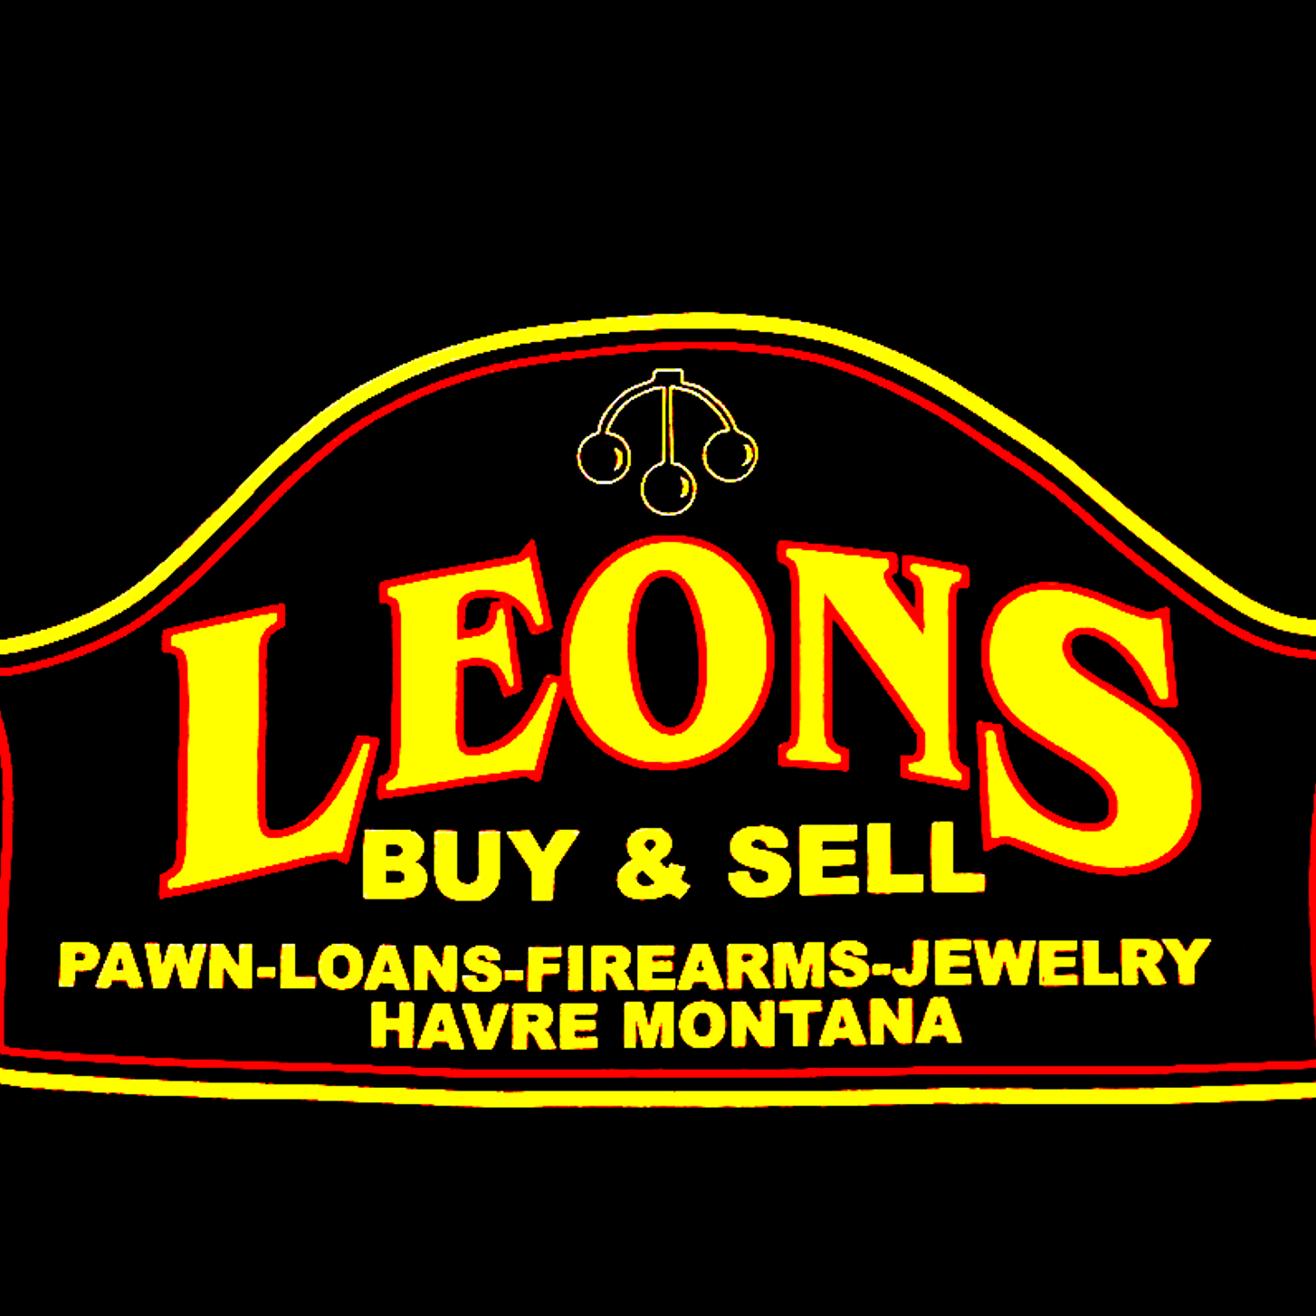 Leons Buy & Sell image 16